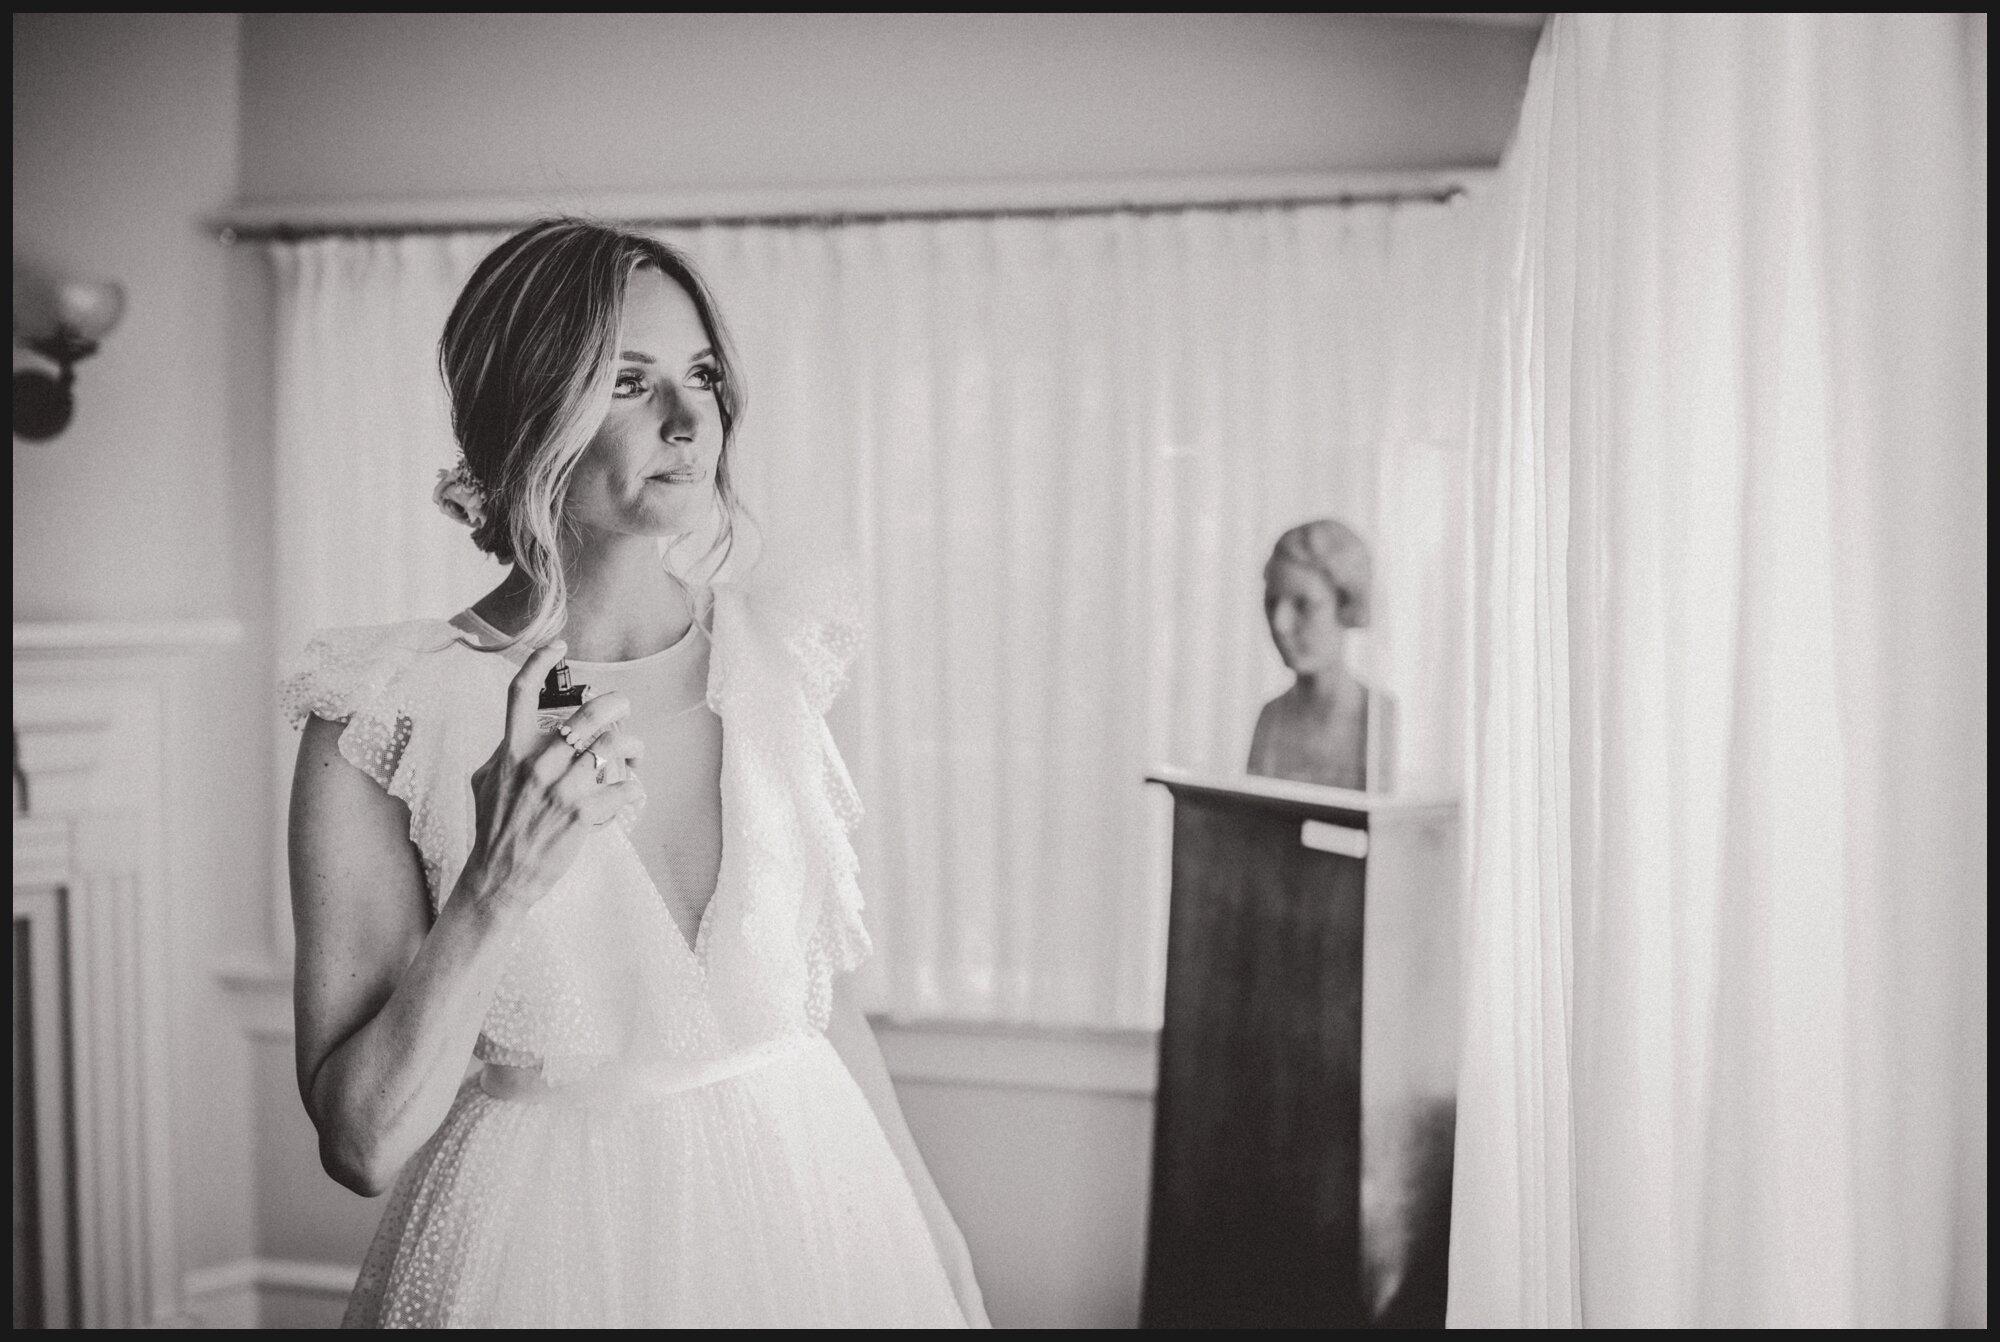 Orlando-Wedding-Photographer-destination-wedding-photographer-florida-wedding-photographer-hawaii-wedding-photographer_0737.jpg